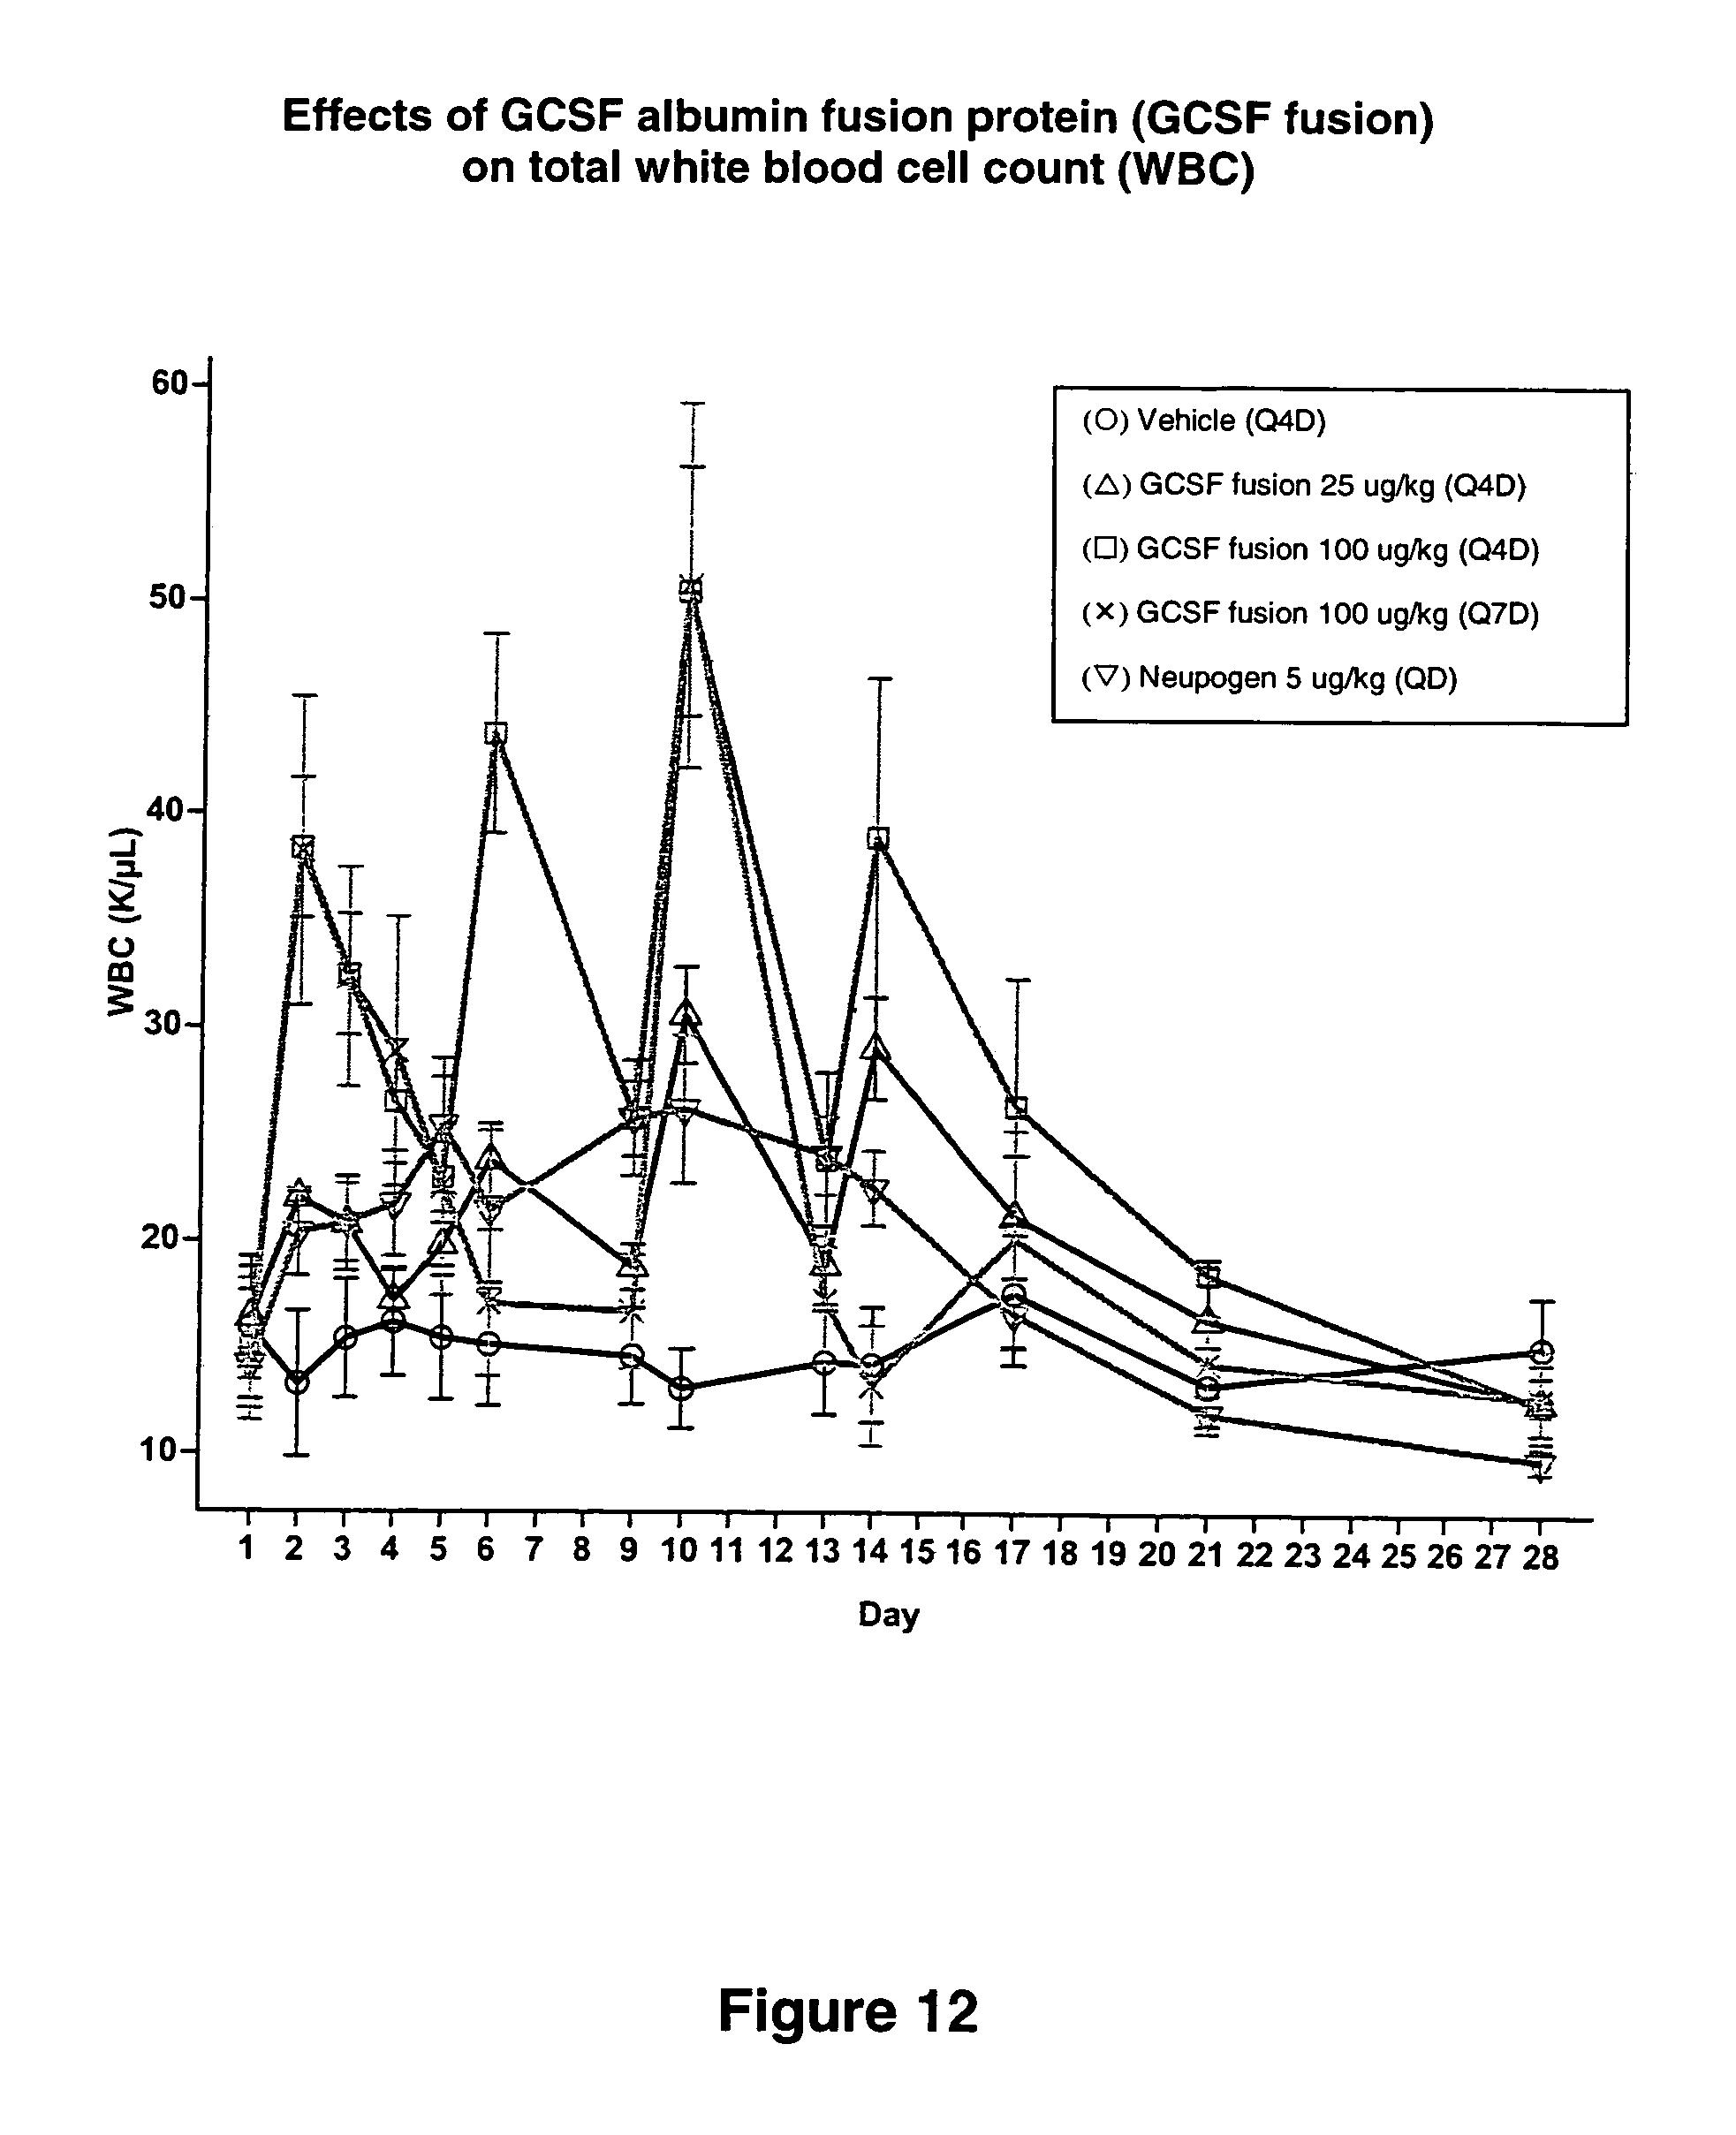 Us7141547b2 albumin fusion proteins comprising glp 1 us7141547b2 albumin fusion proteins comprising glp 1 polypeptides google patents ccuart Choice Image